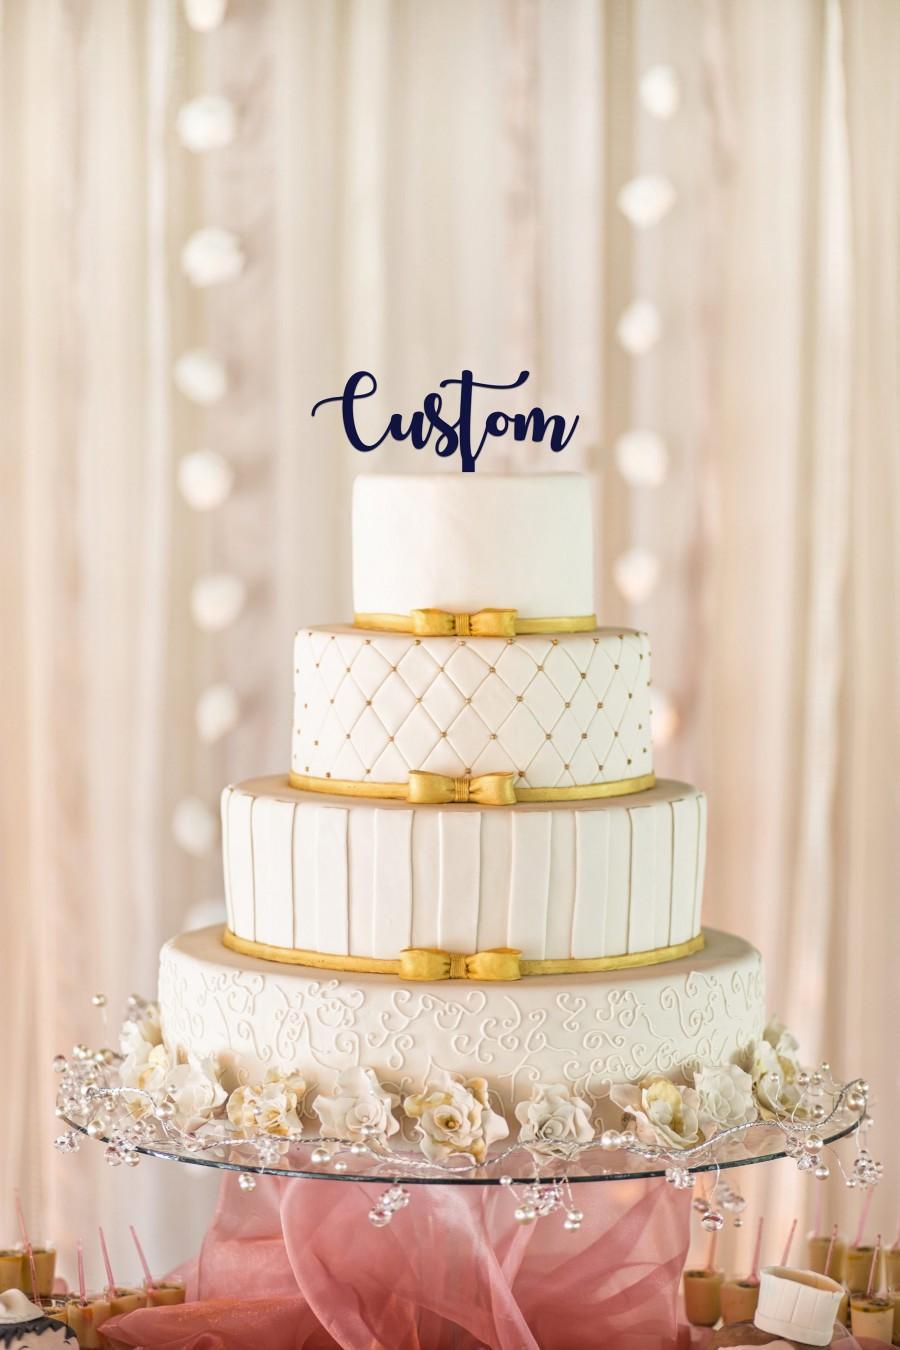 Mariage - Custom Wedding Cake Topper, Personalized Wedding Cake Topper, Personalized Cake Topper, Custom Cake Topper, Custom Wedding Cake Topper